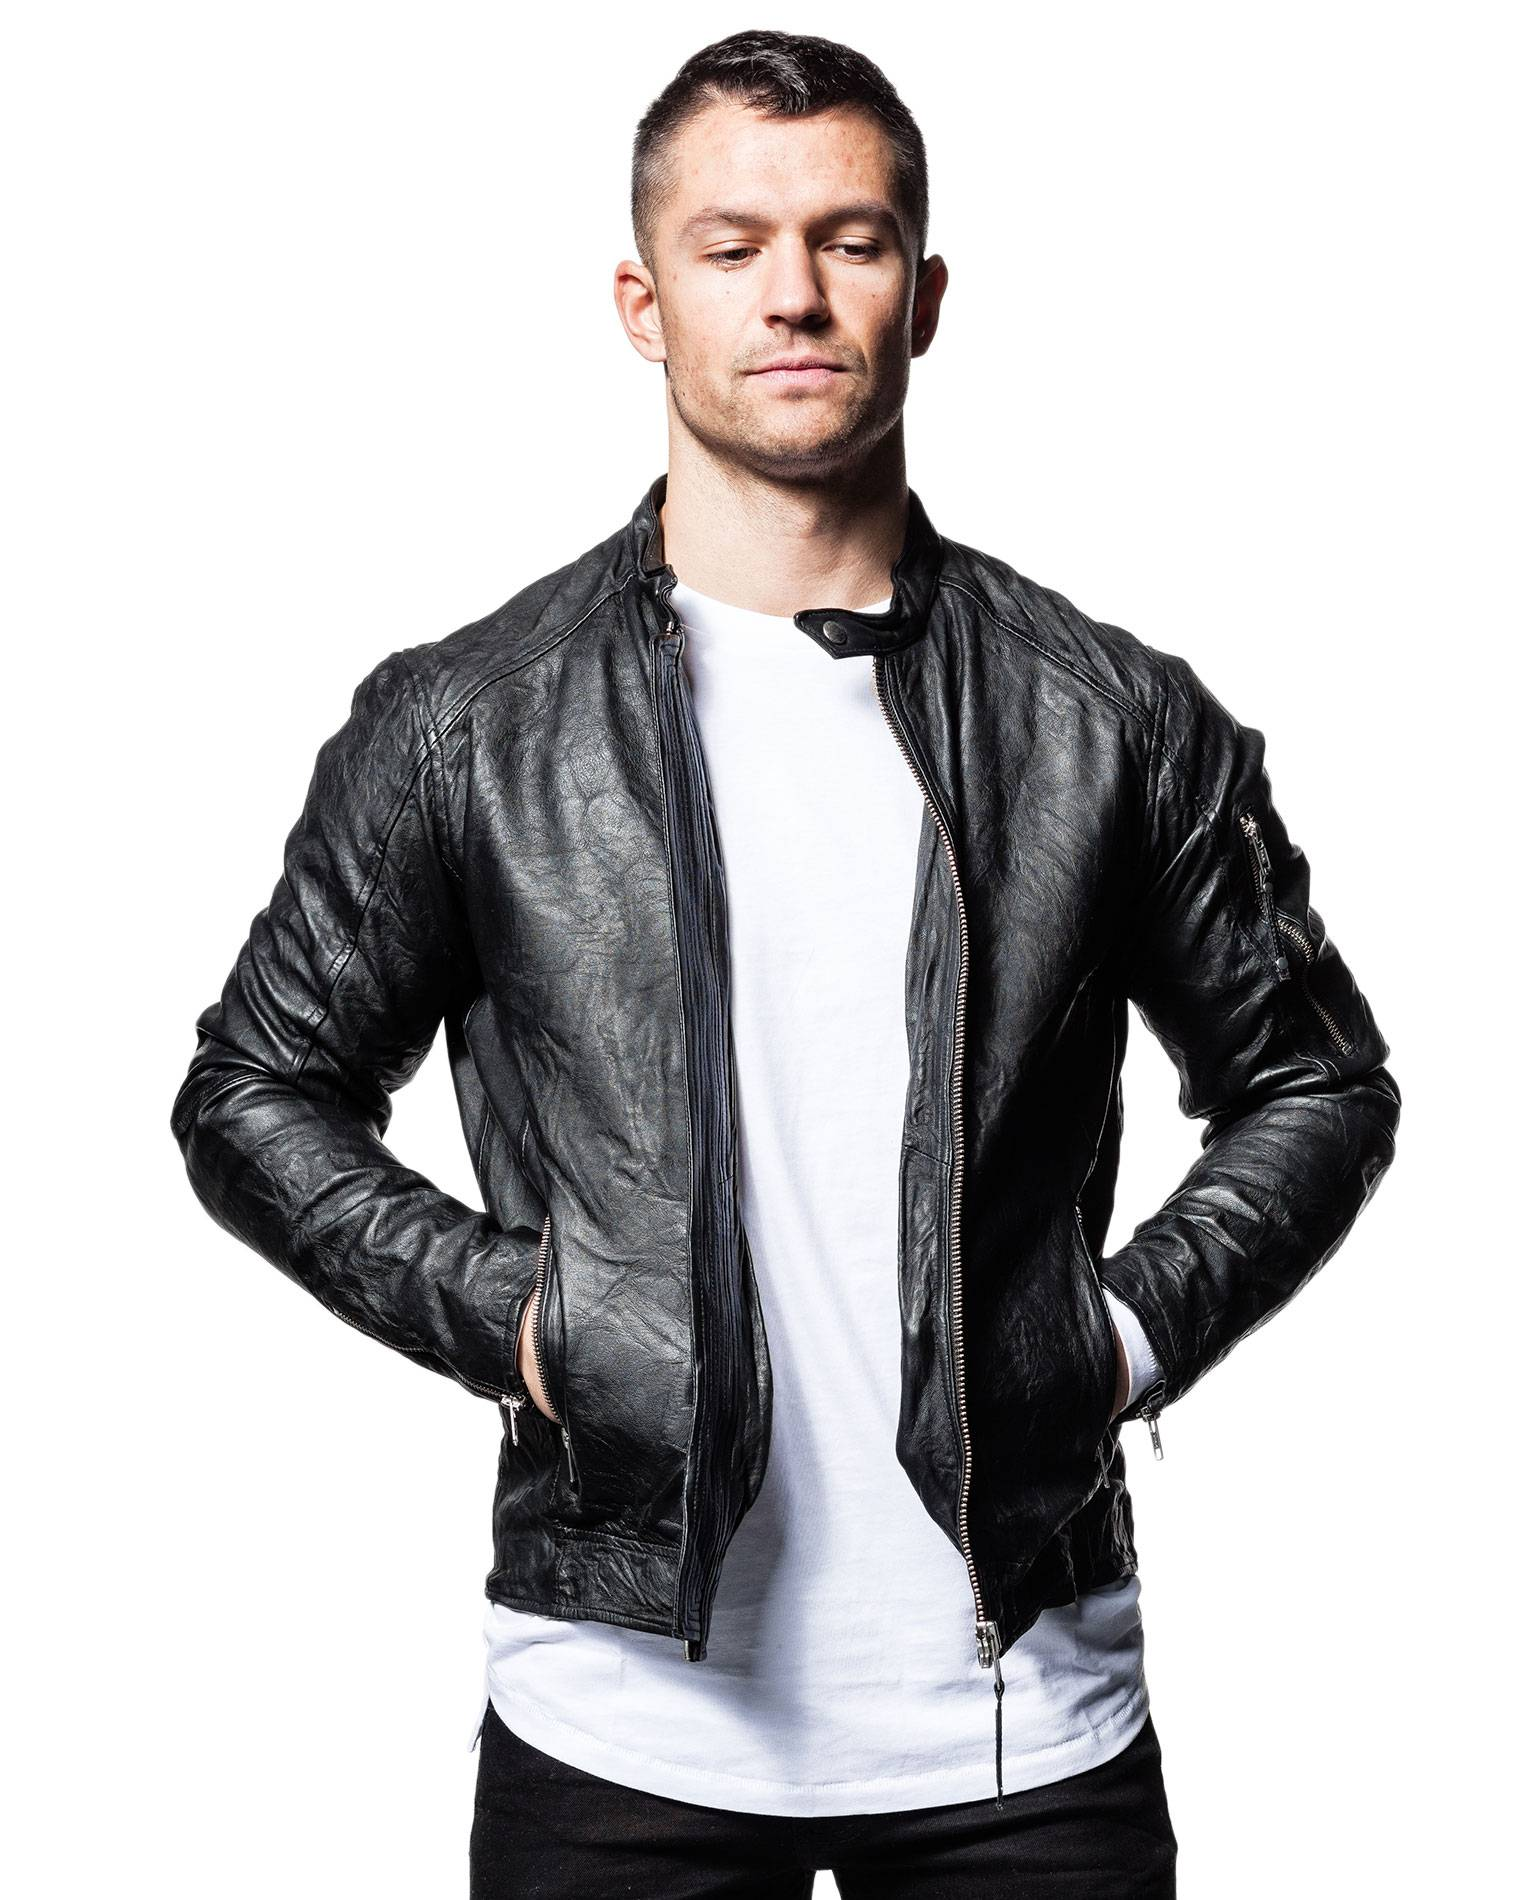 Richard Real Leather Jacket Jack & Jones